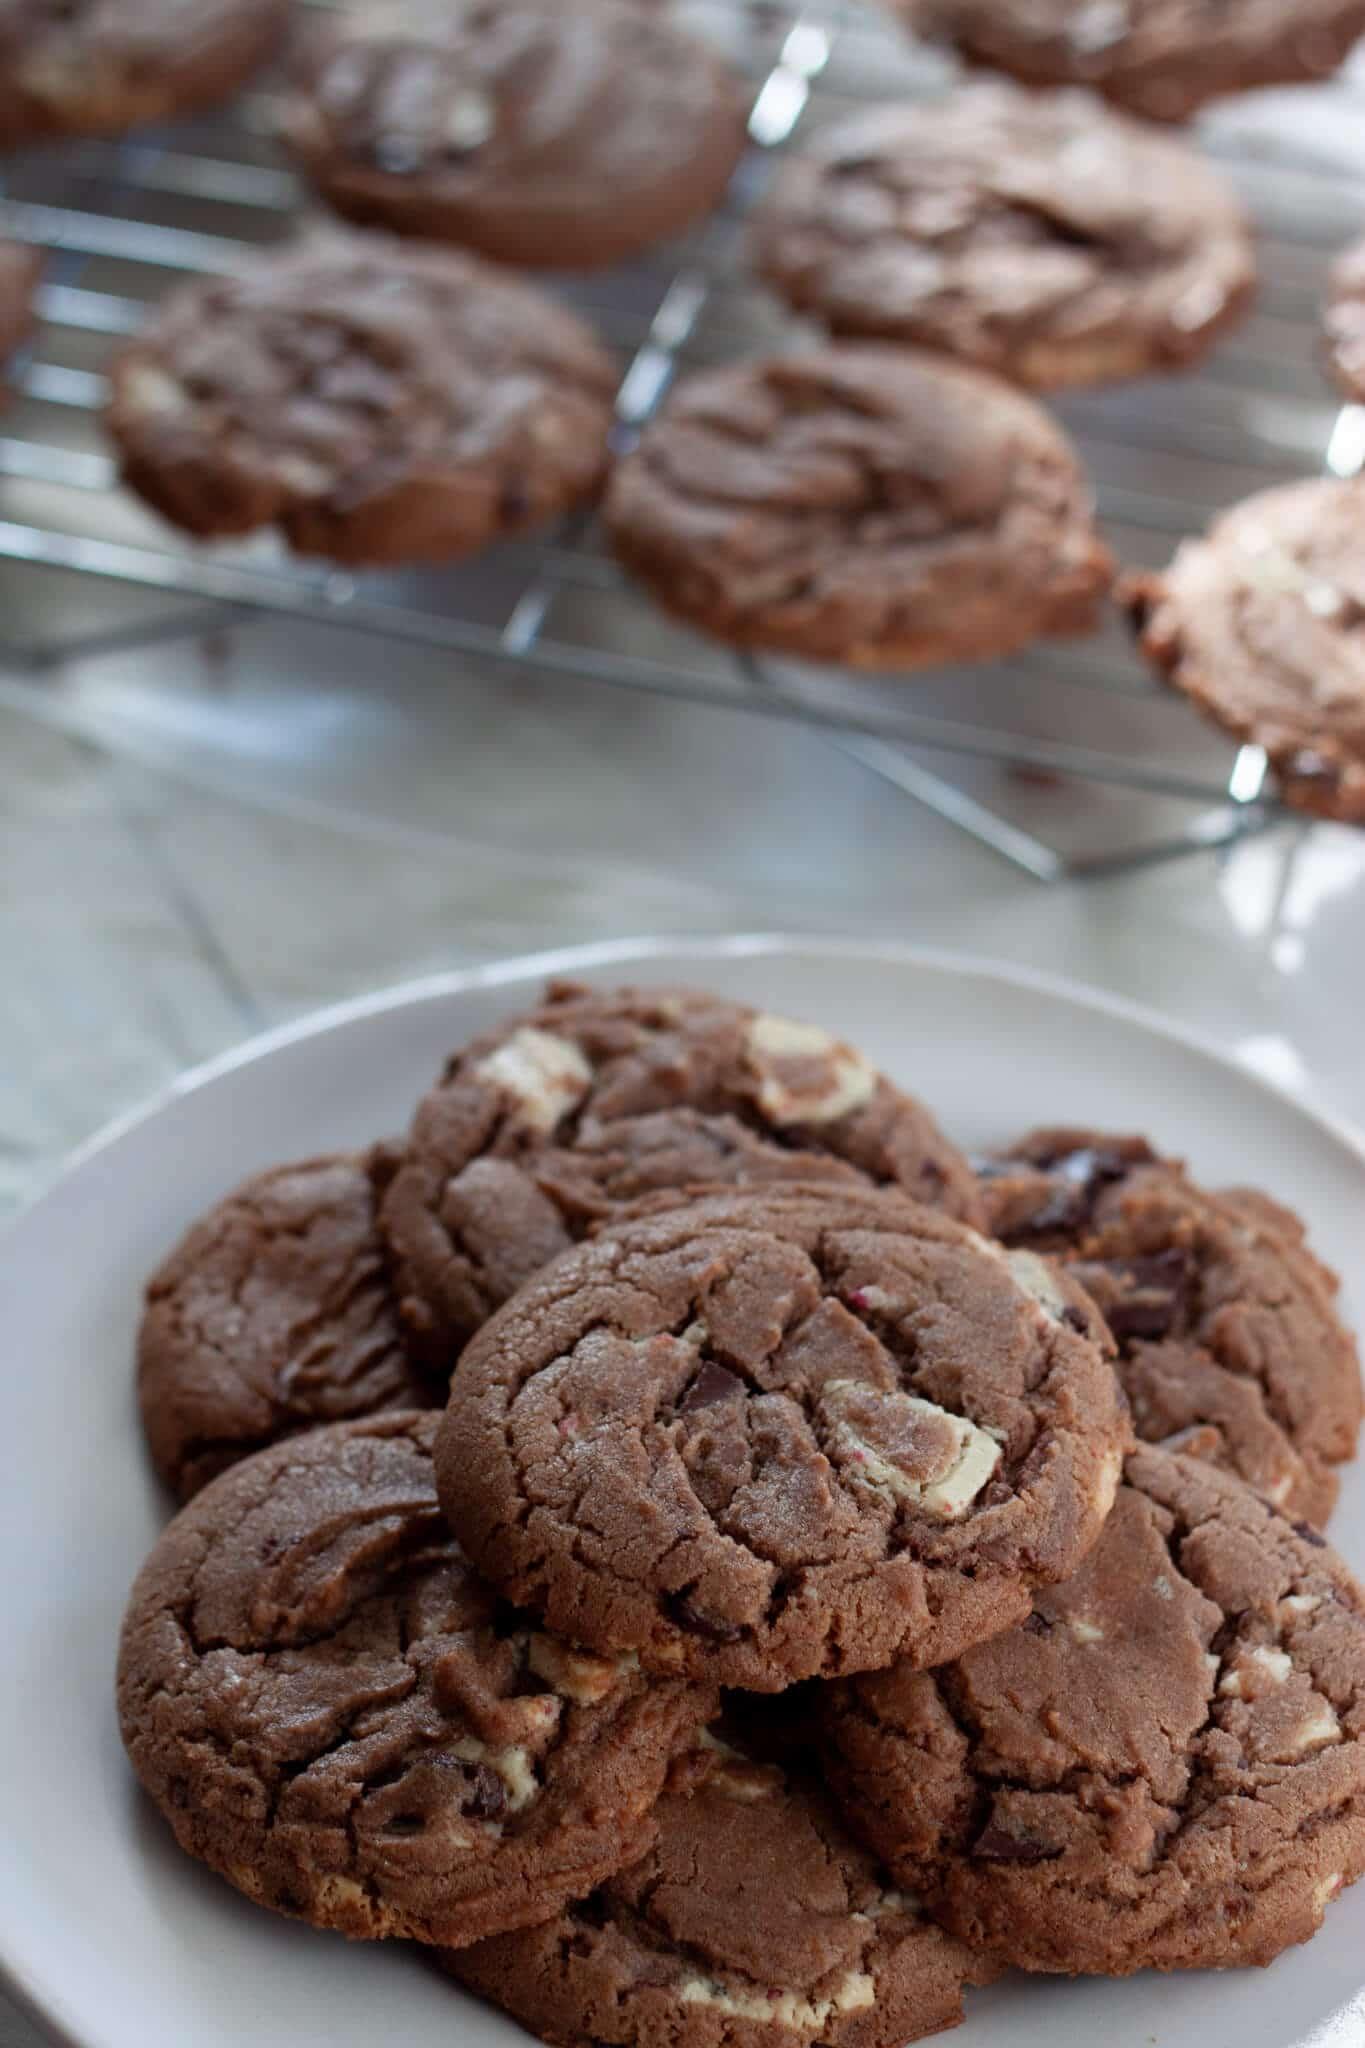 Ghirardelli Hot Chocolate Cookies